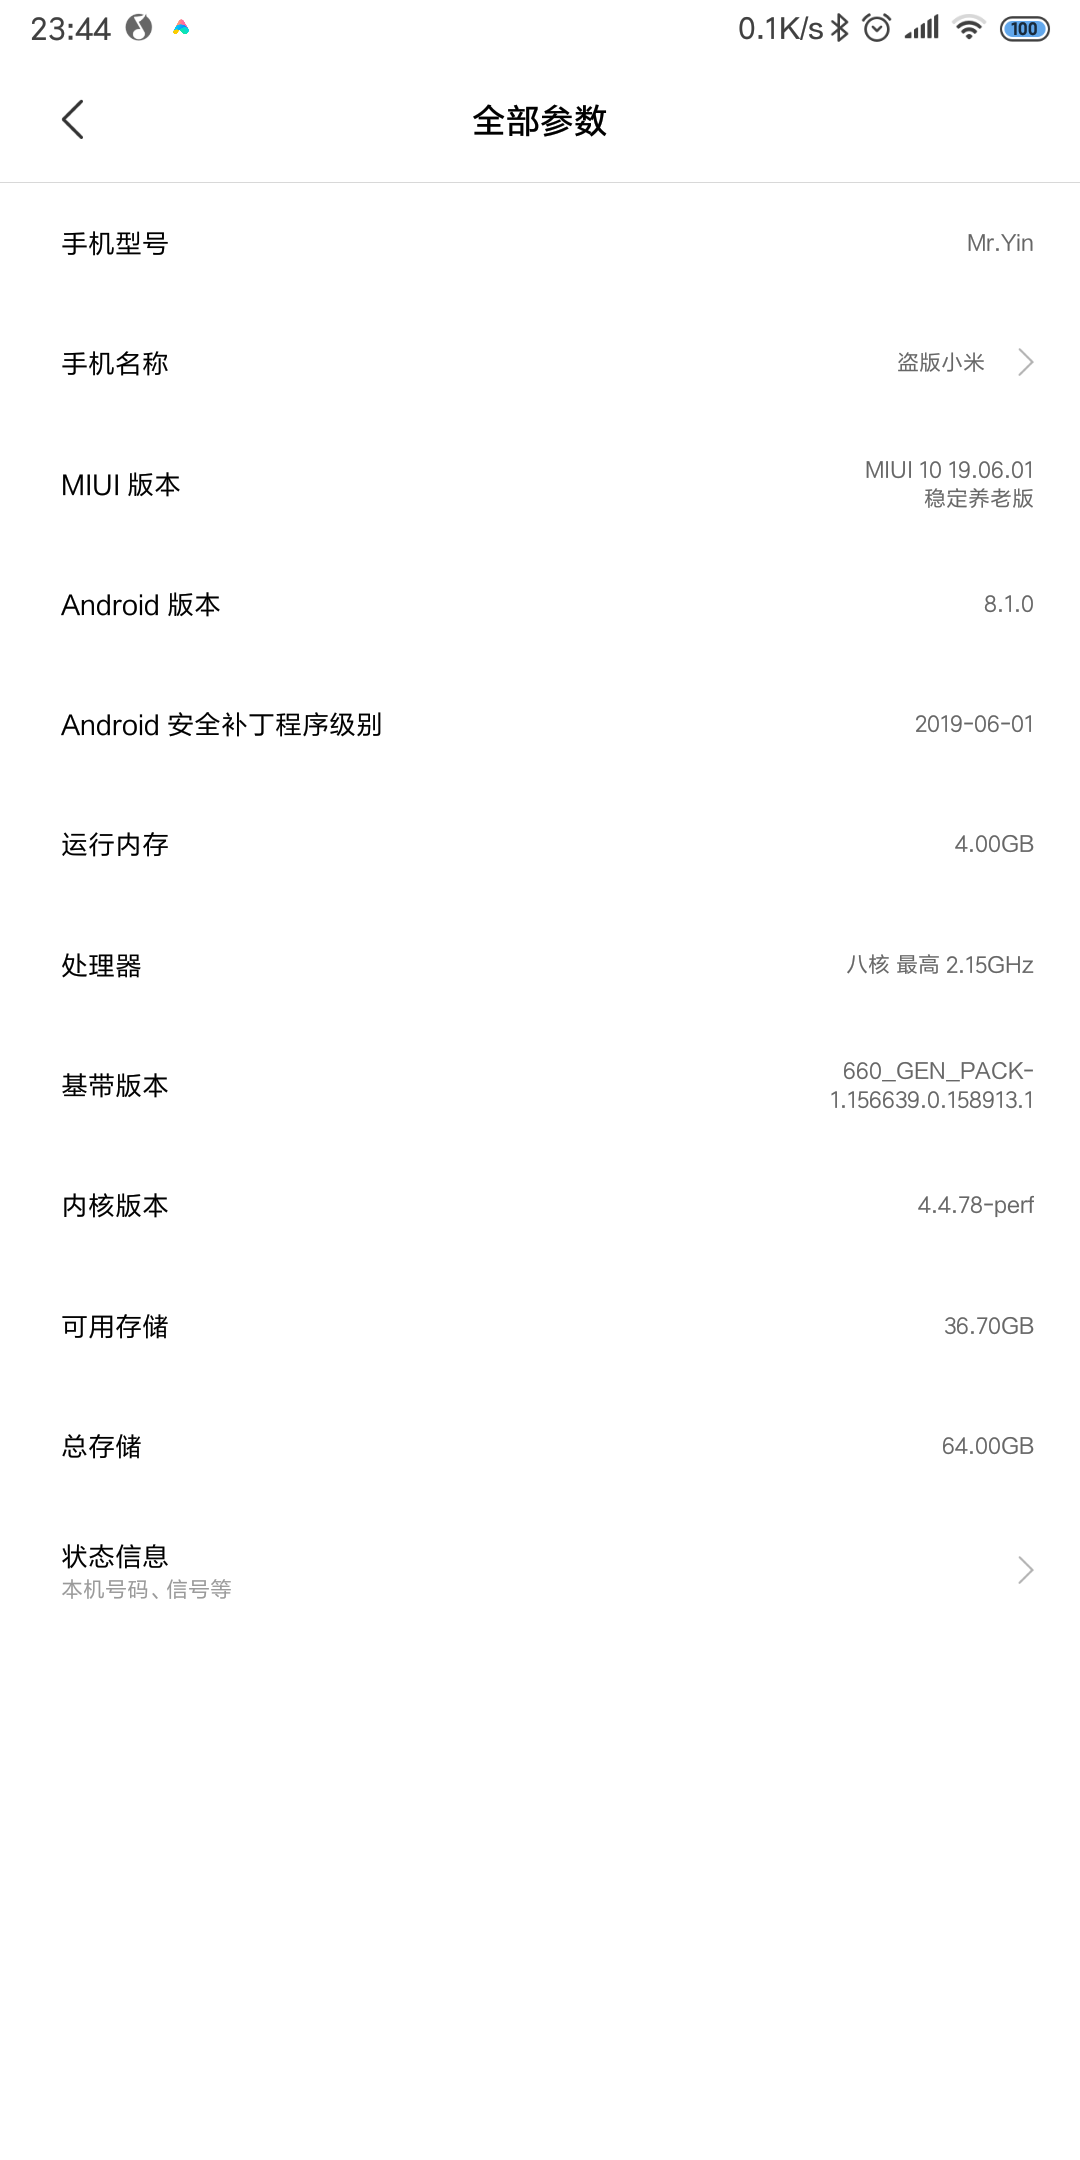 Screenshot_2019-08-22-23-44-40-280_com.android.settings.png